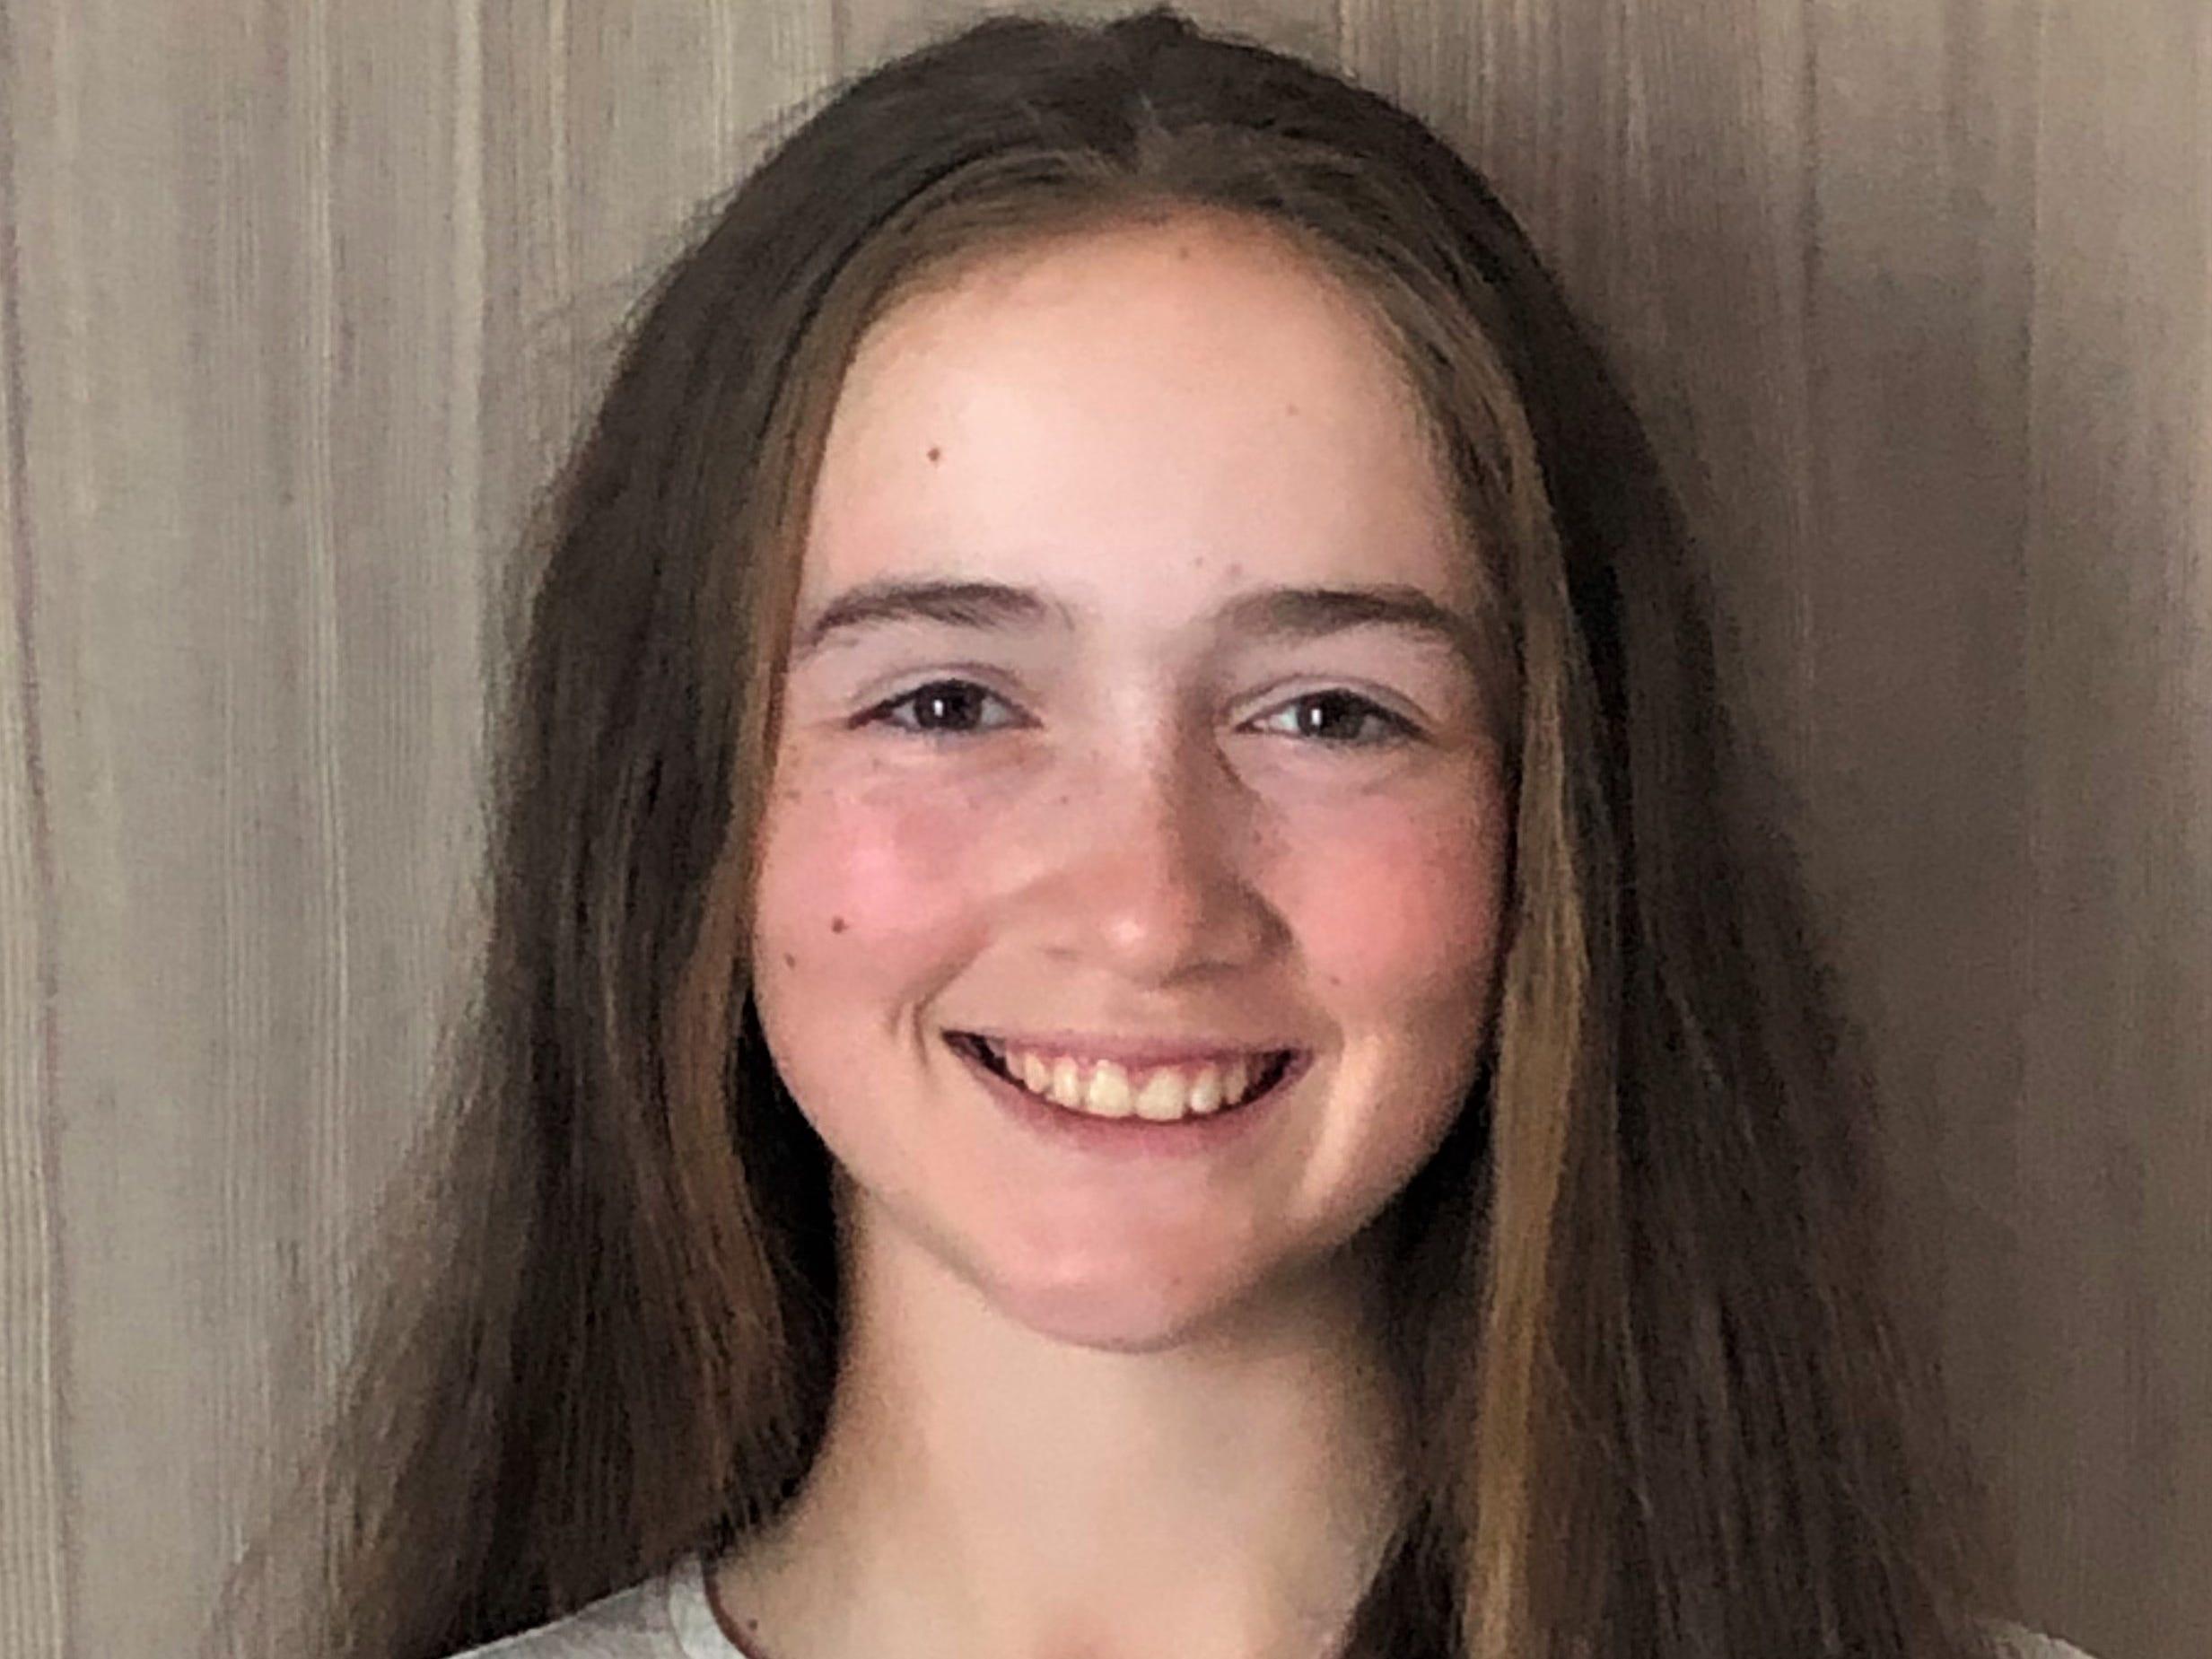 Community Christian eighth-grader Sabree Lefebvre